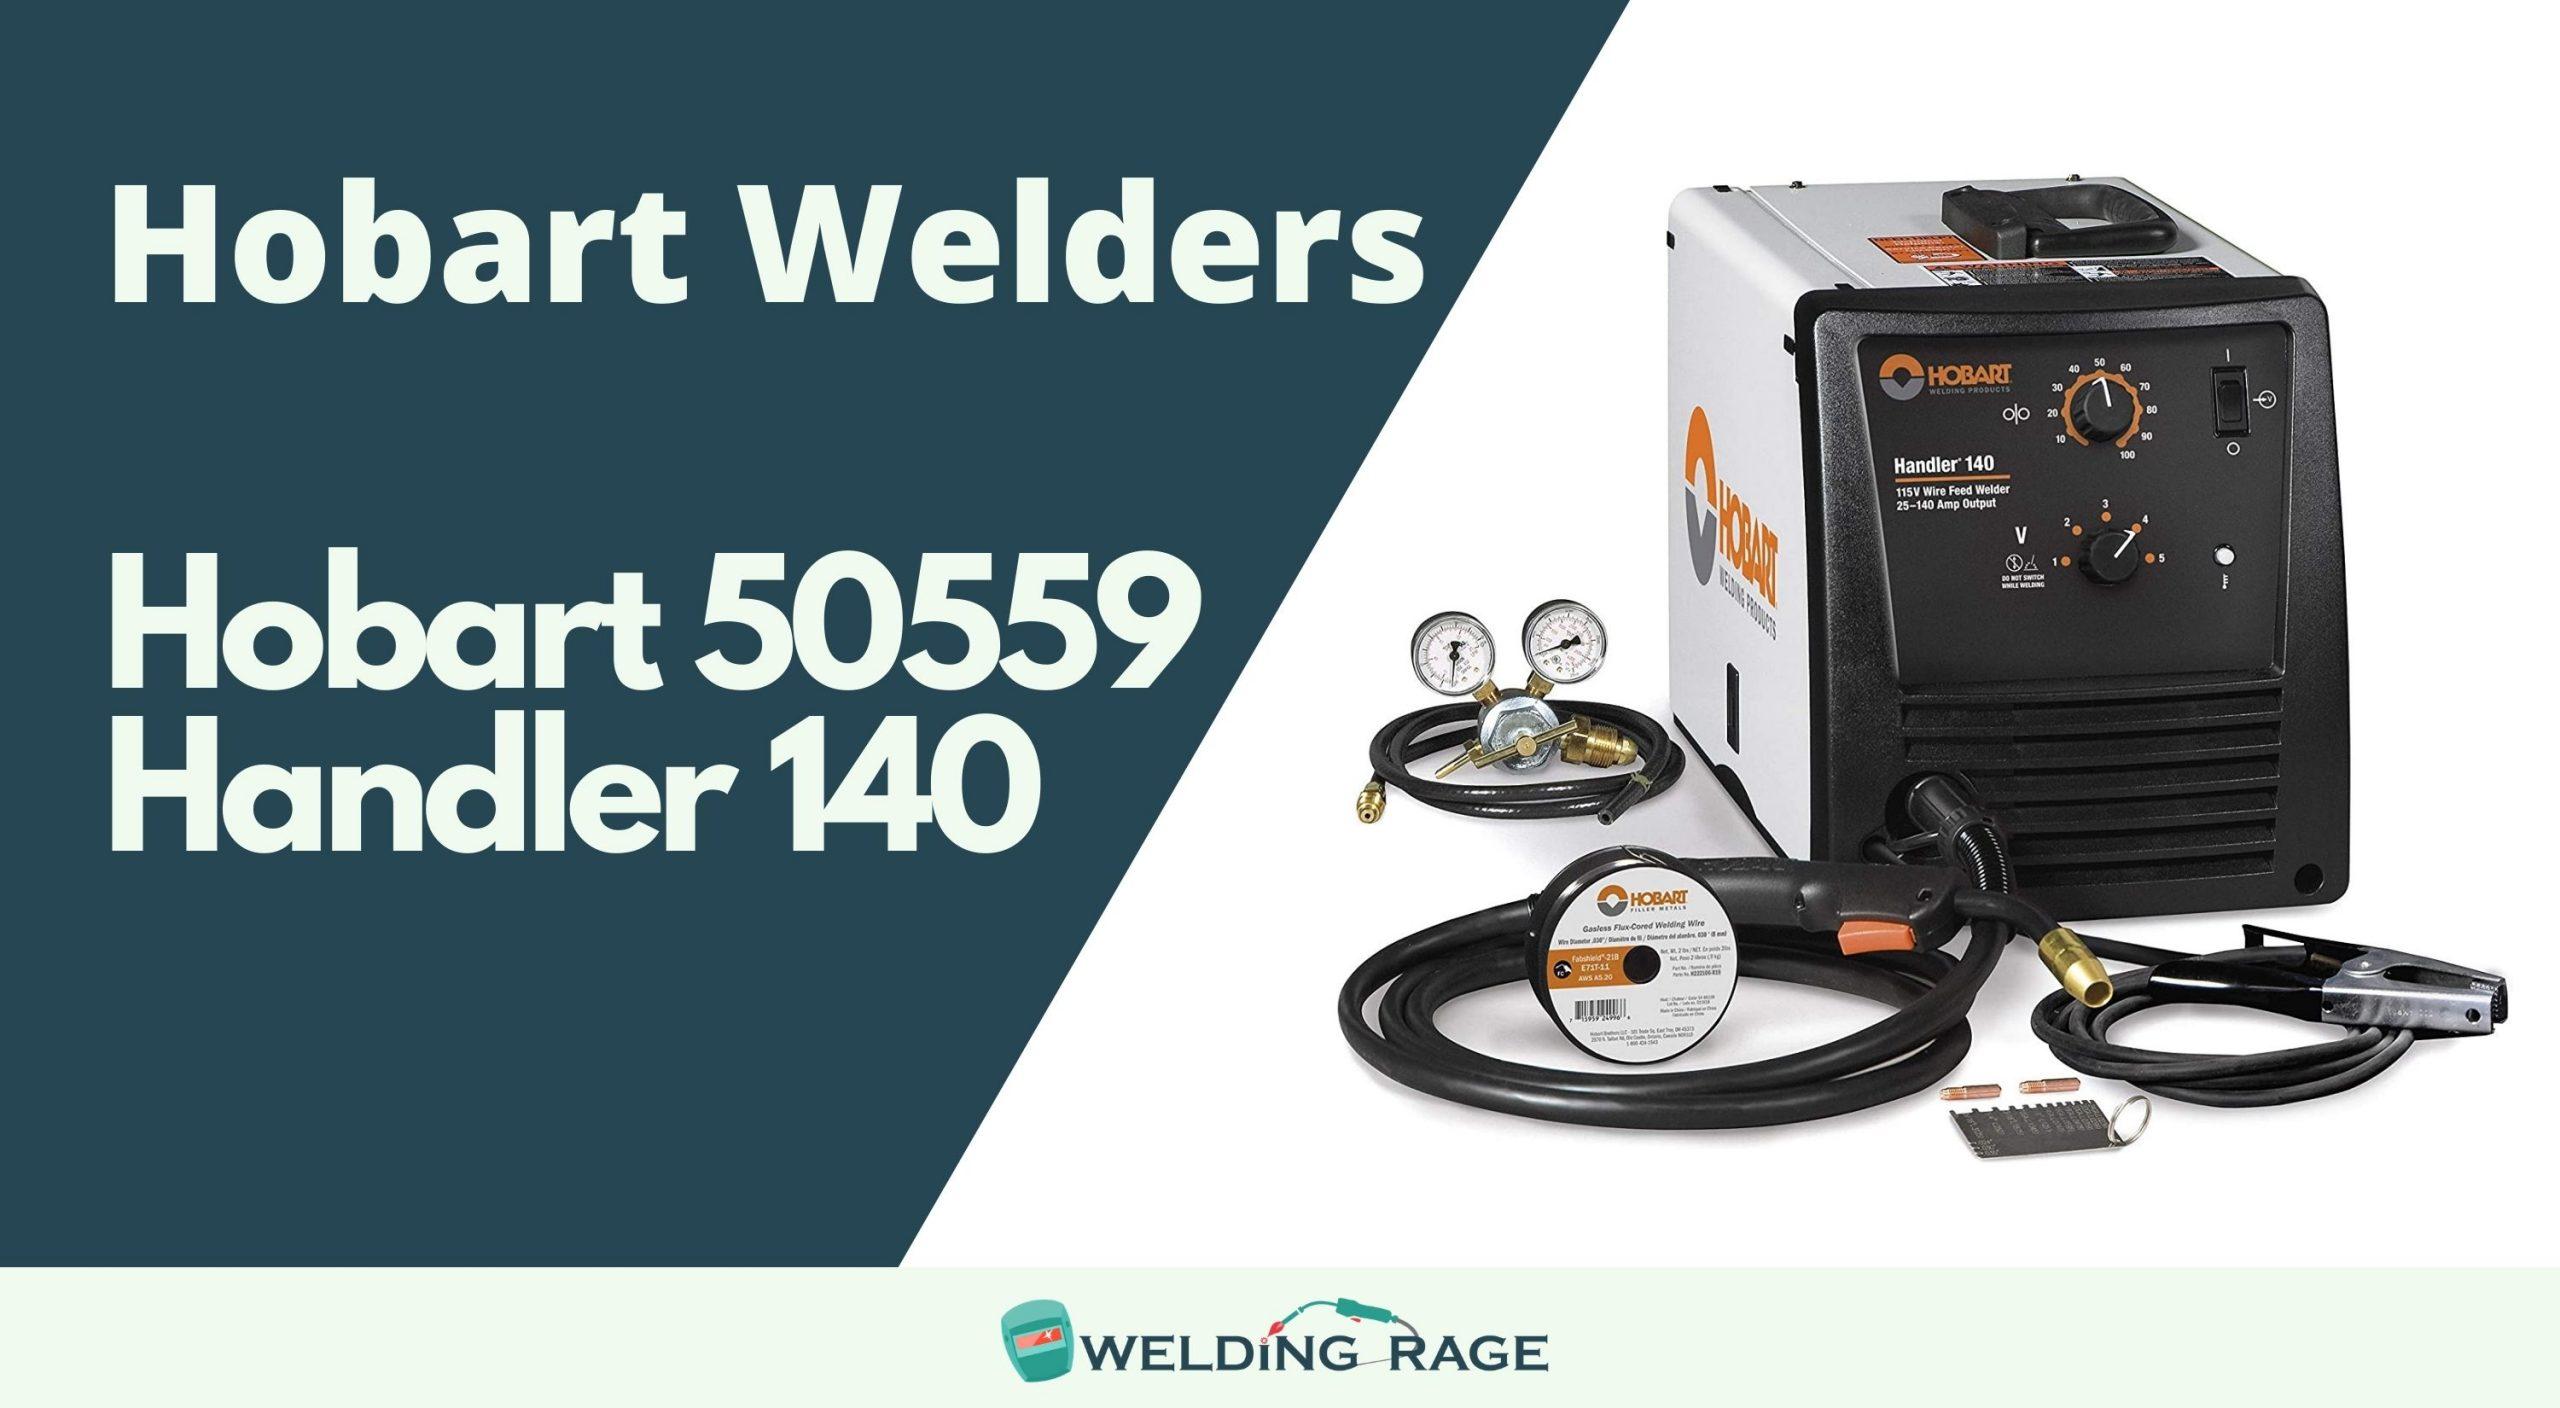 weldingrage.com